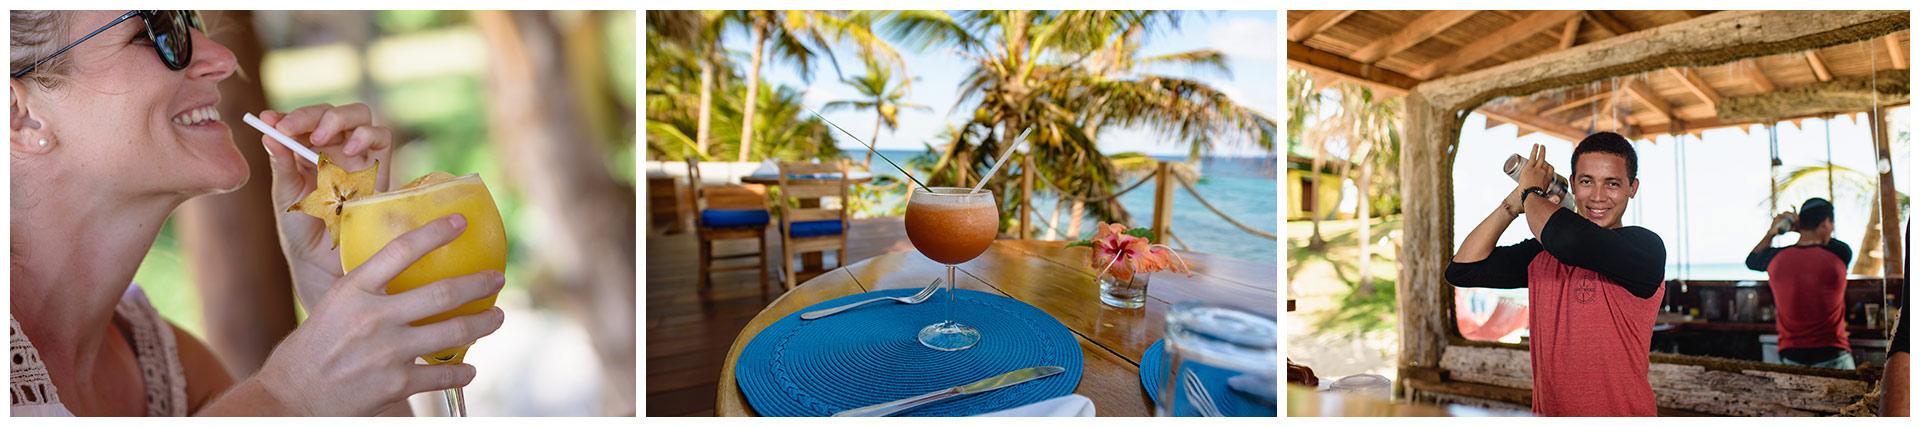 Beach-menu